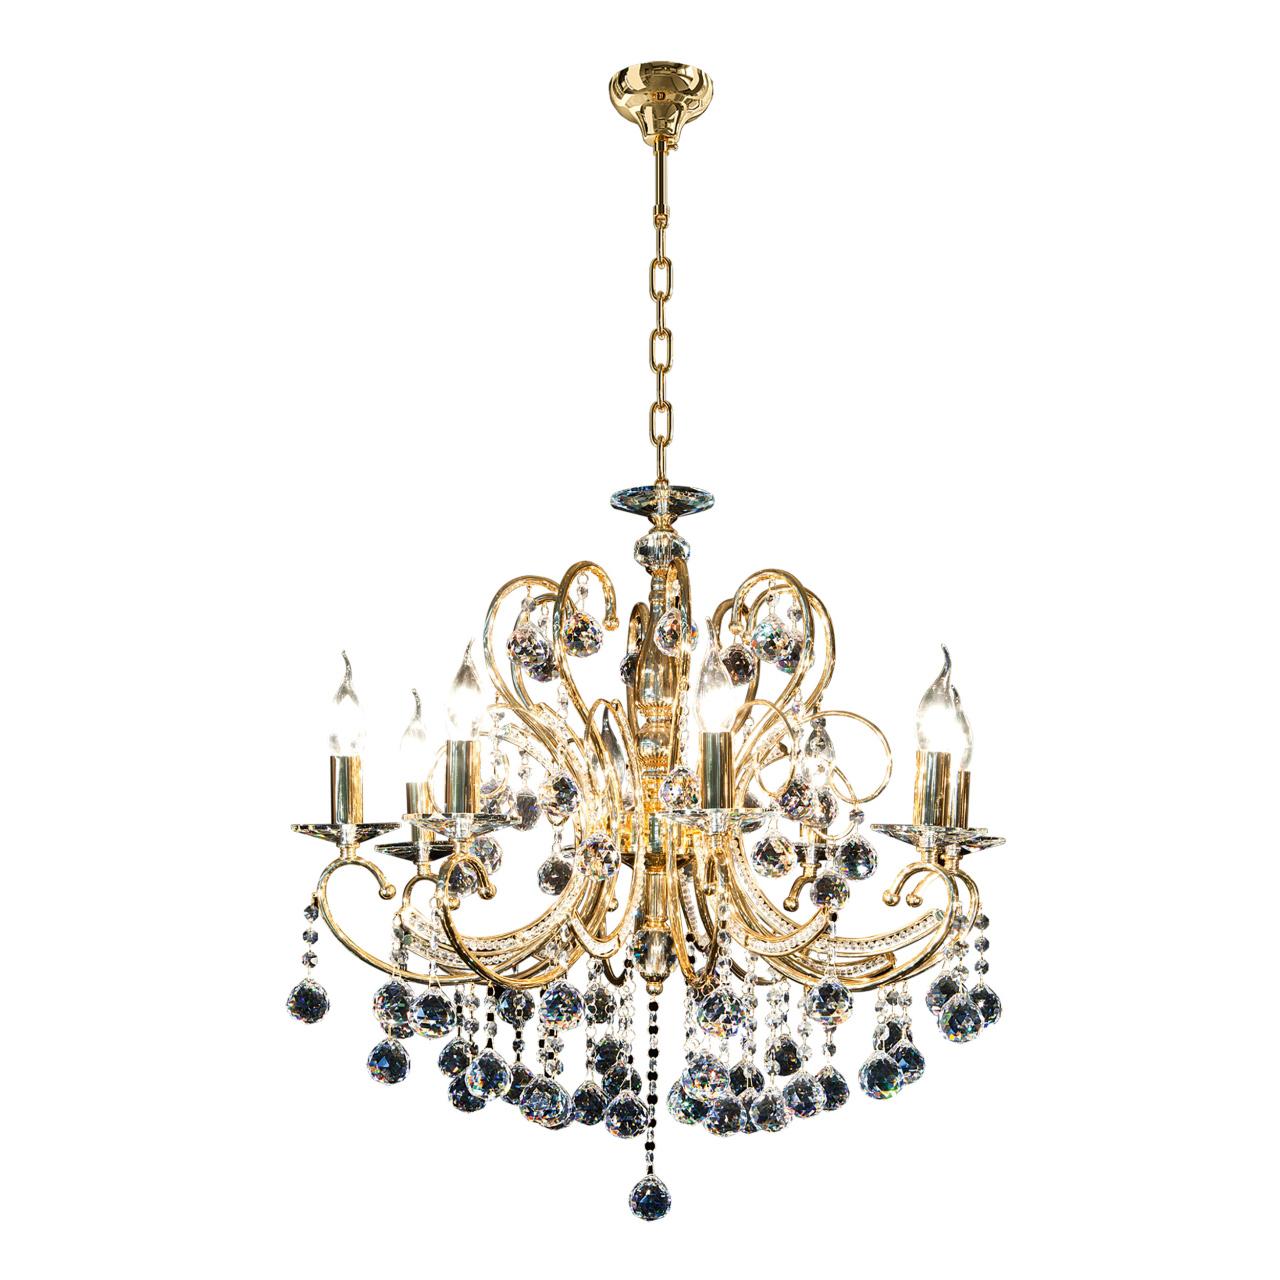 Люстра подвесная Elegante 8х60W E14 24K золото Osgona 708082